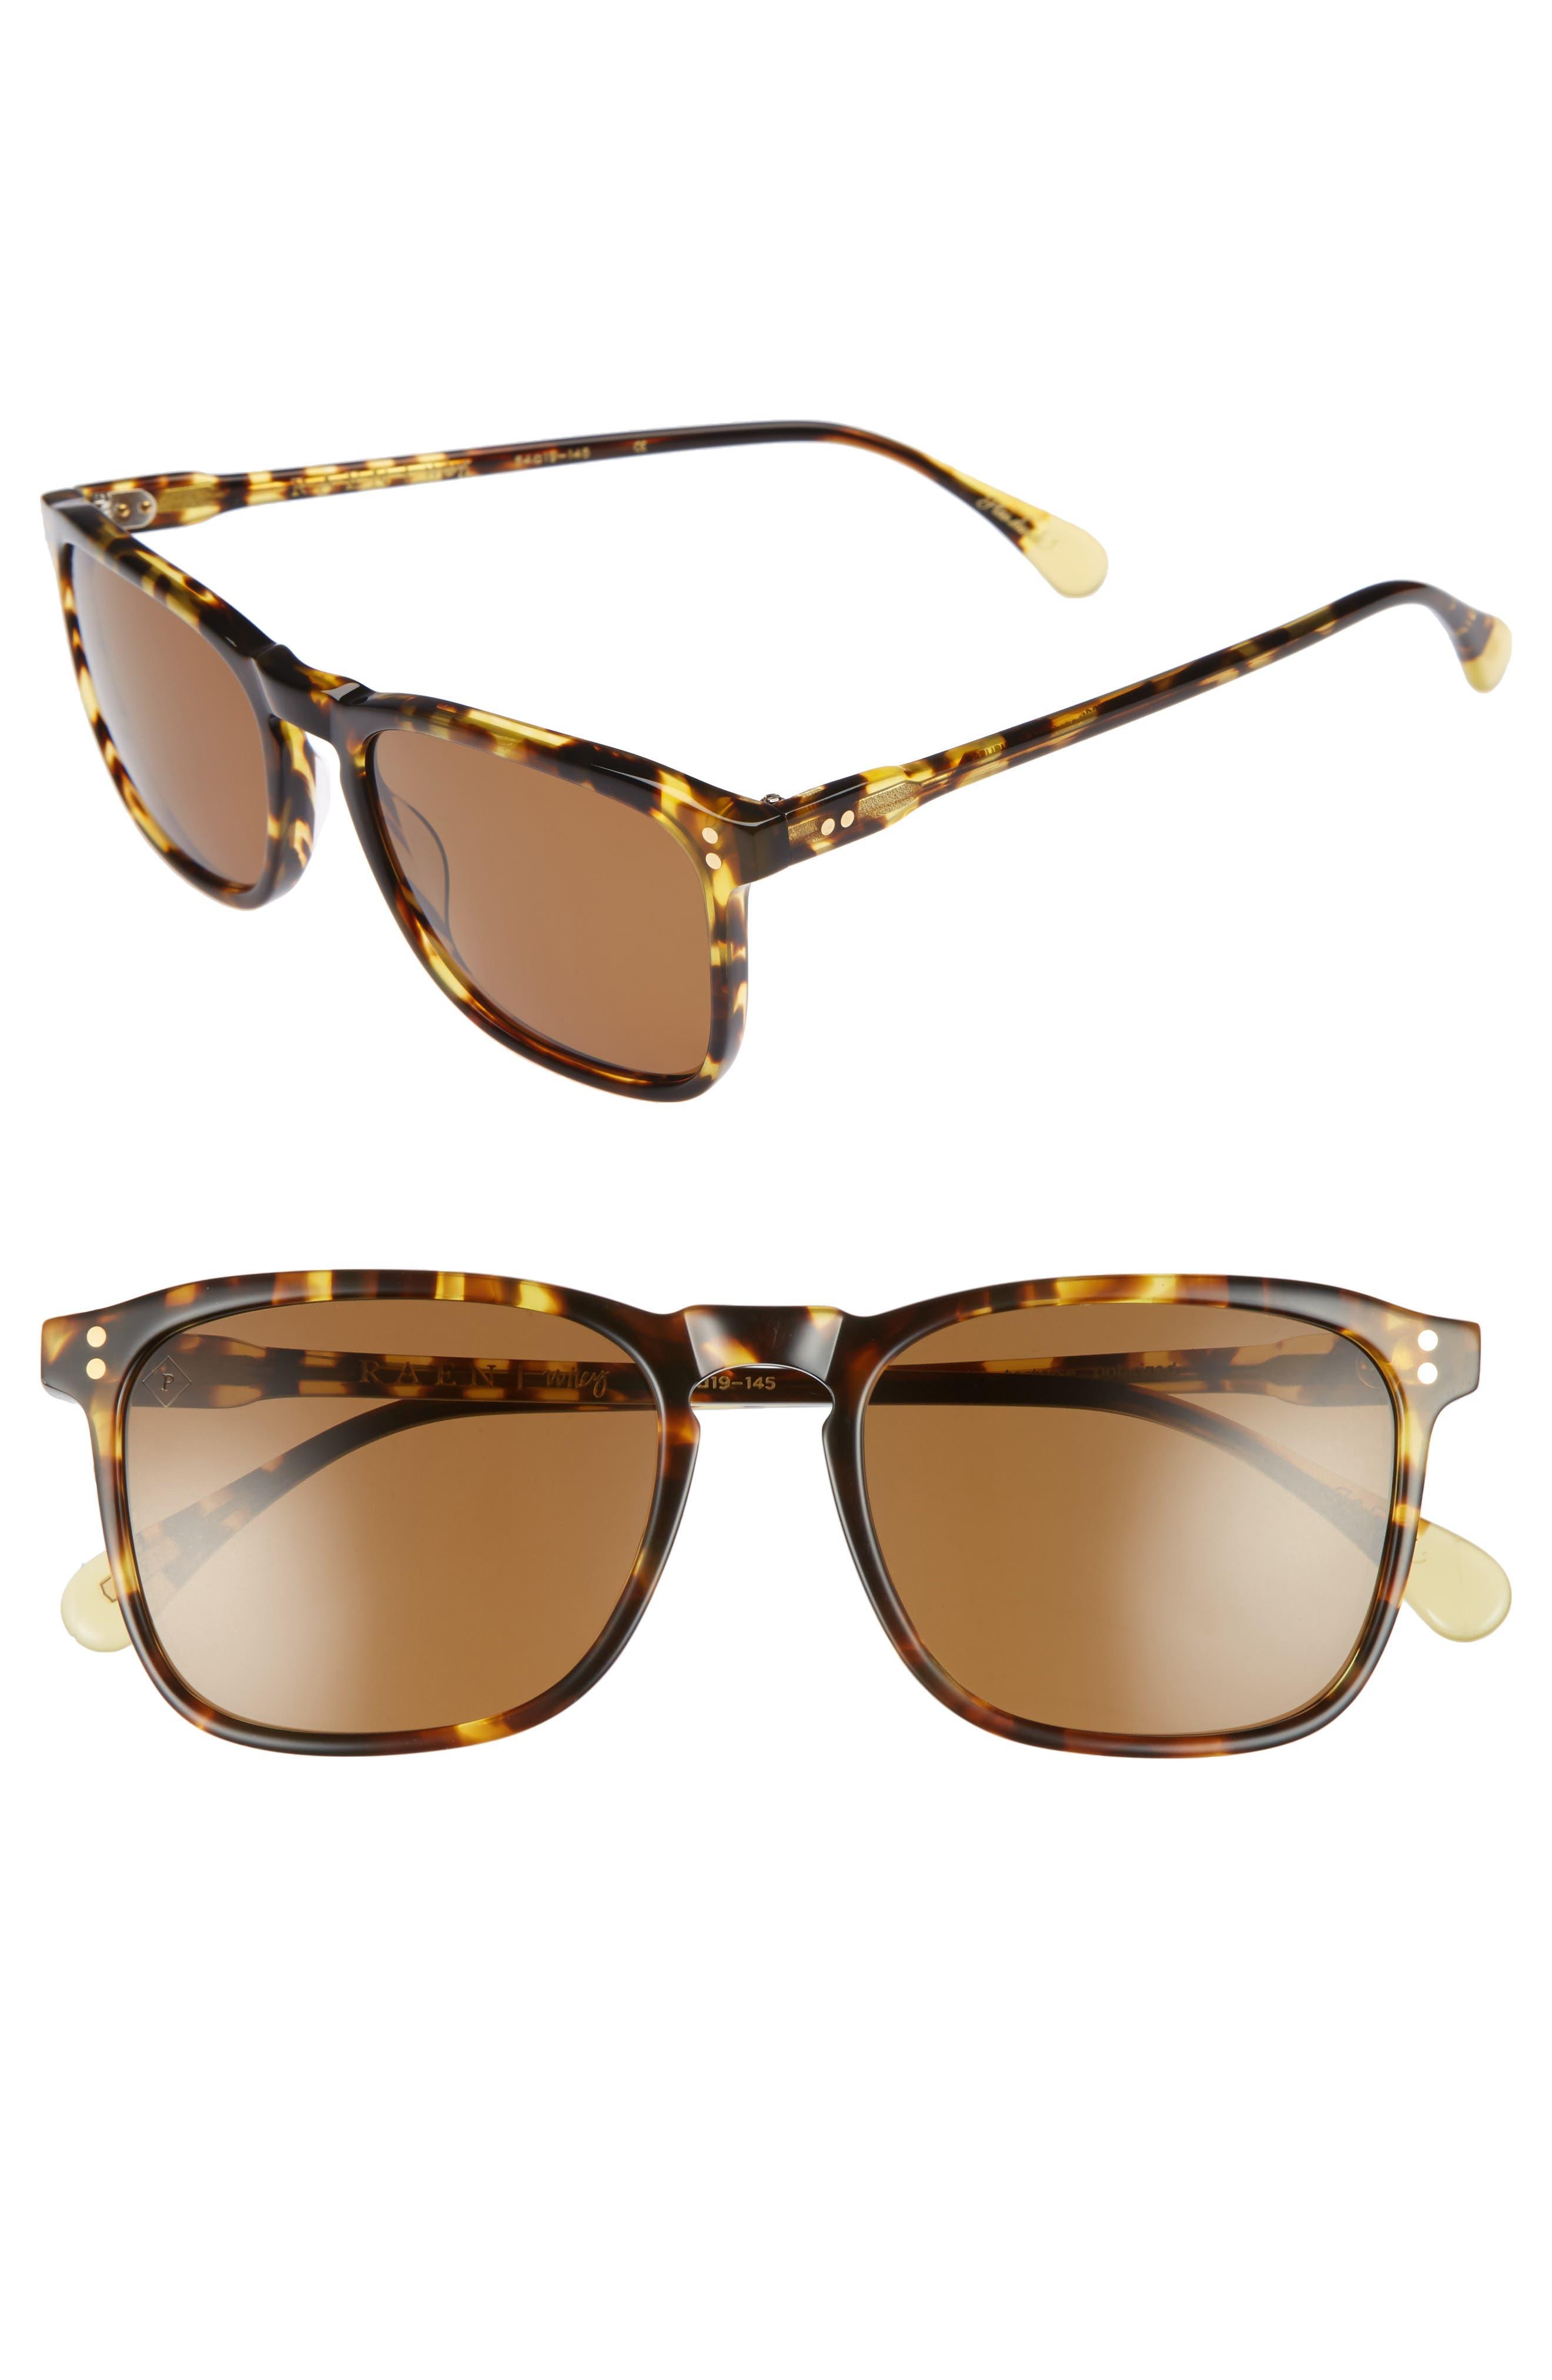 Wiley 54mm Polarized Sunglasses,                         Main,                         color, 205